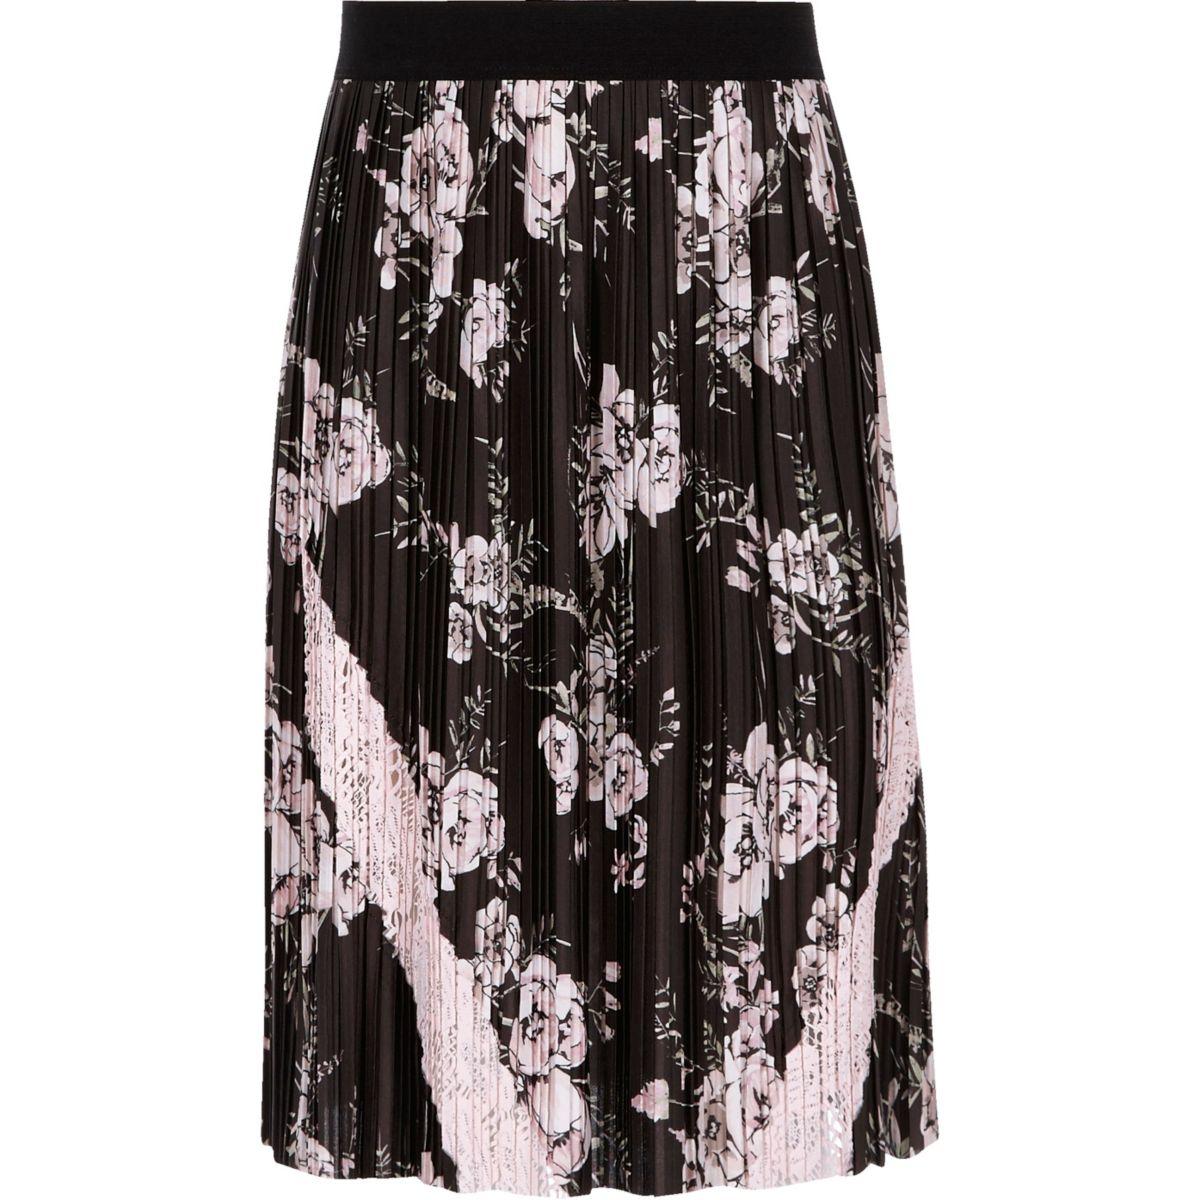 Girls black pleated floral midi skirt